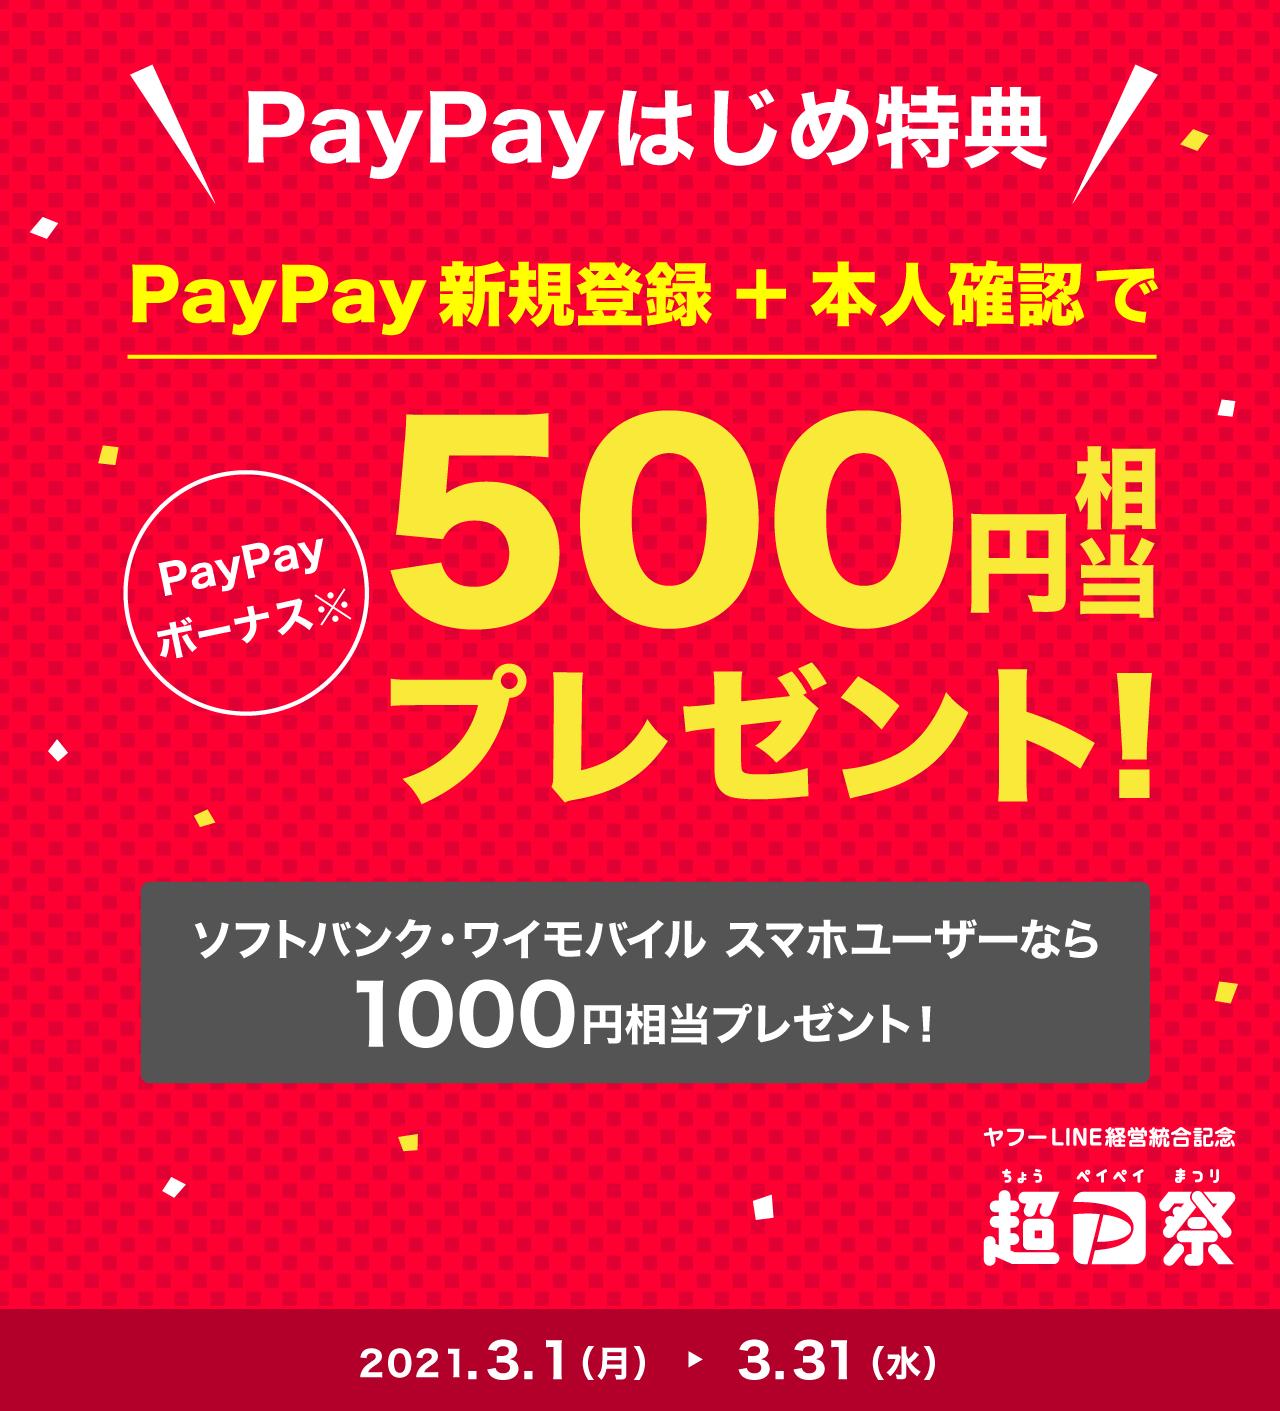 PayPayはじめ特典 PayPay新規登録+本人確認でPayPayボーナス500円相当プレゼント! ソフバンク・ワイモバイル スマホユーザーなら1000円相当プレゼント!